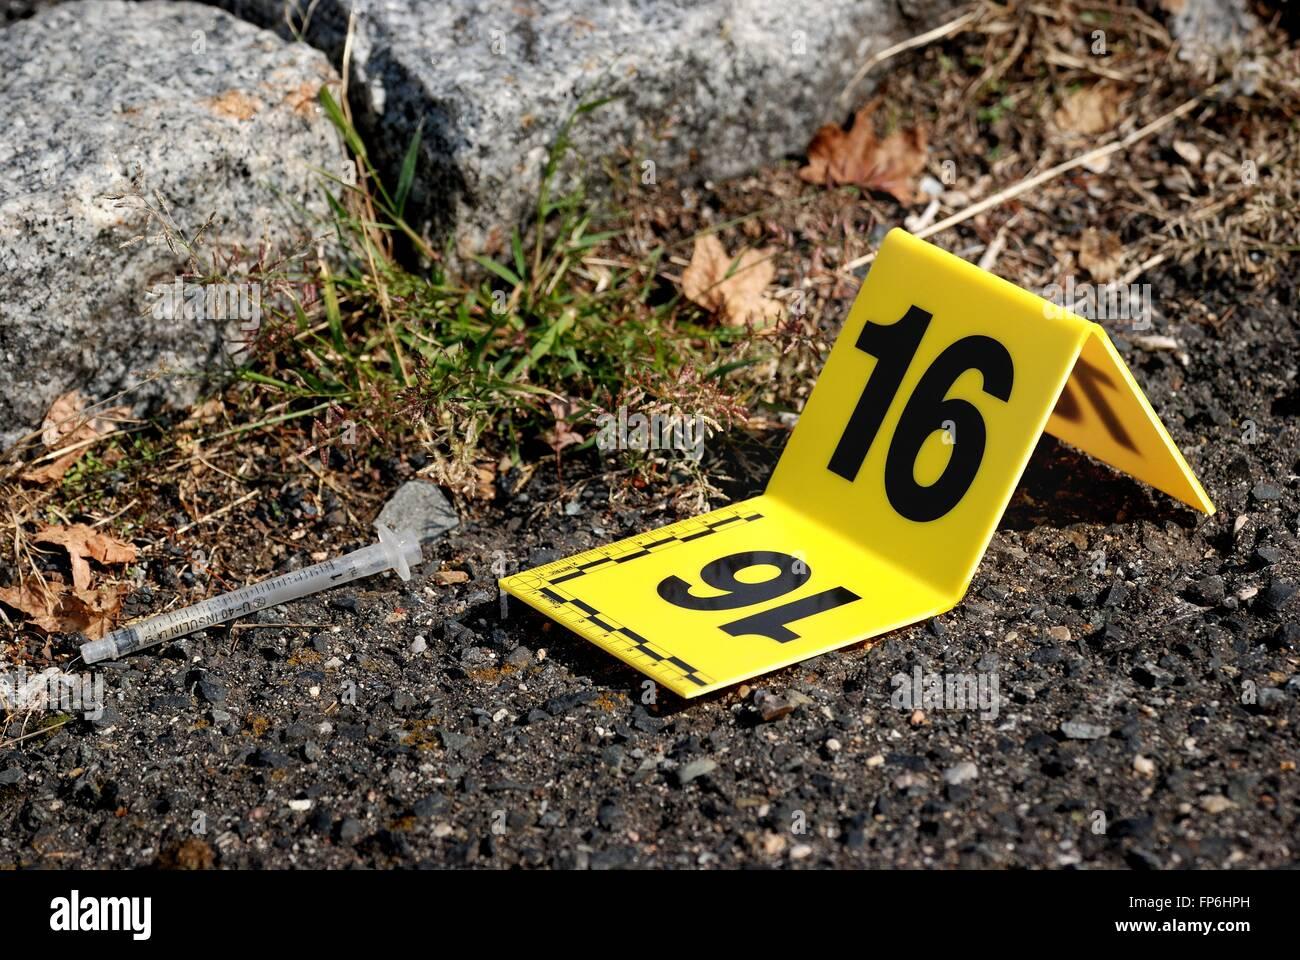 Crime Scene Evidence Marker Next to Syringe - Stock Image